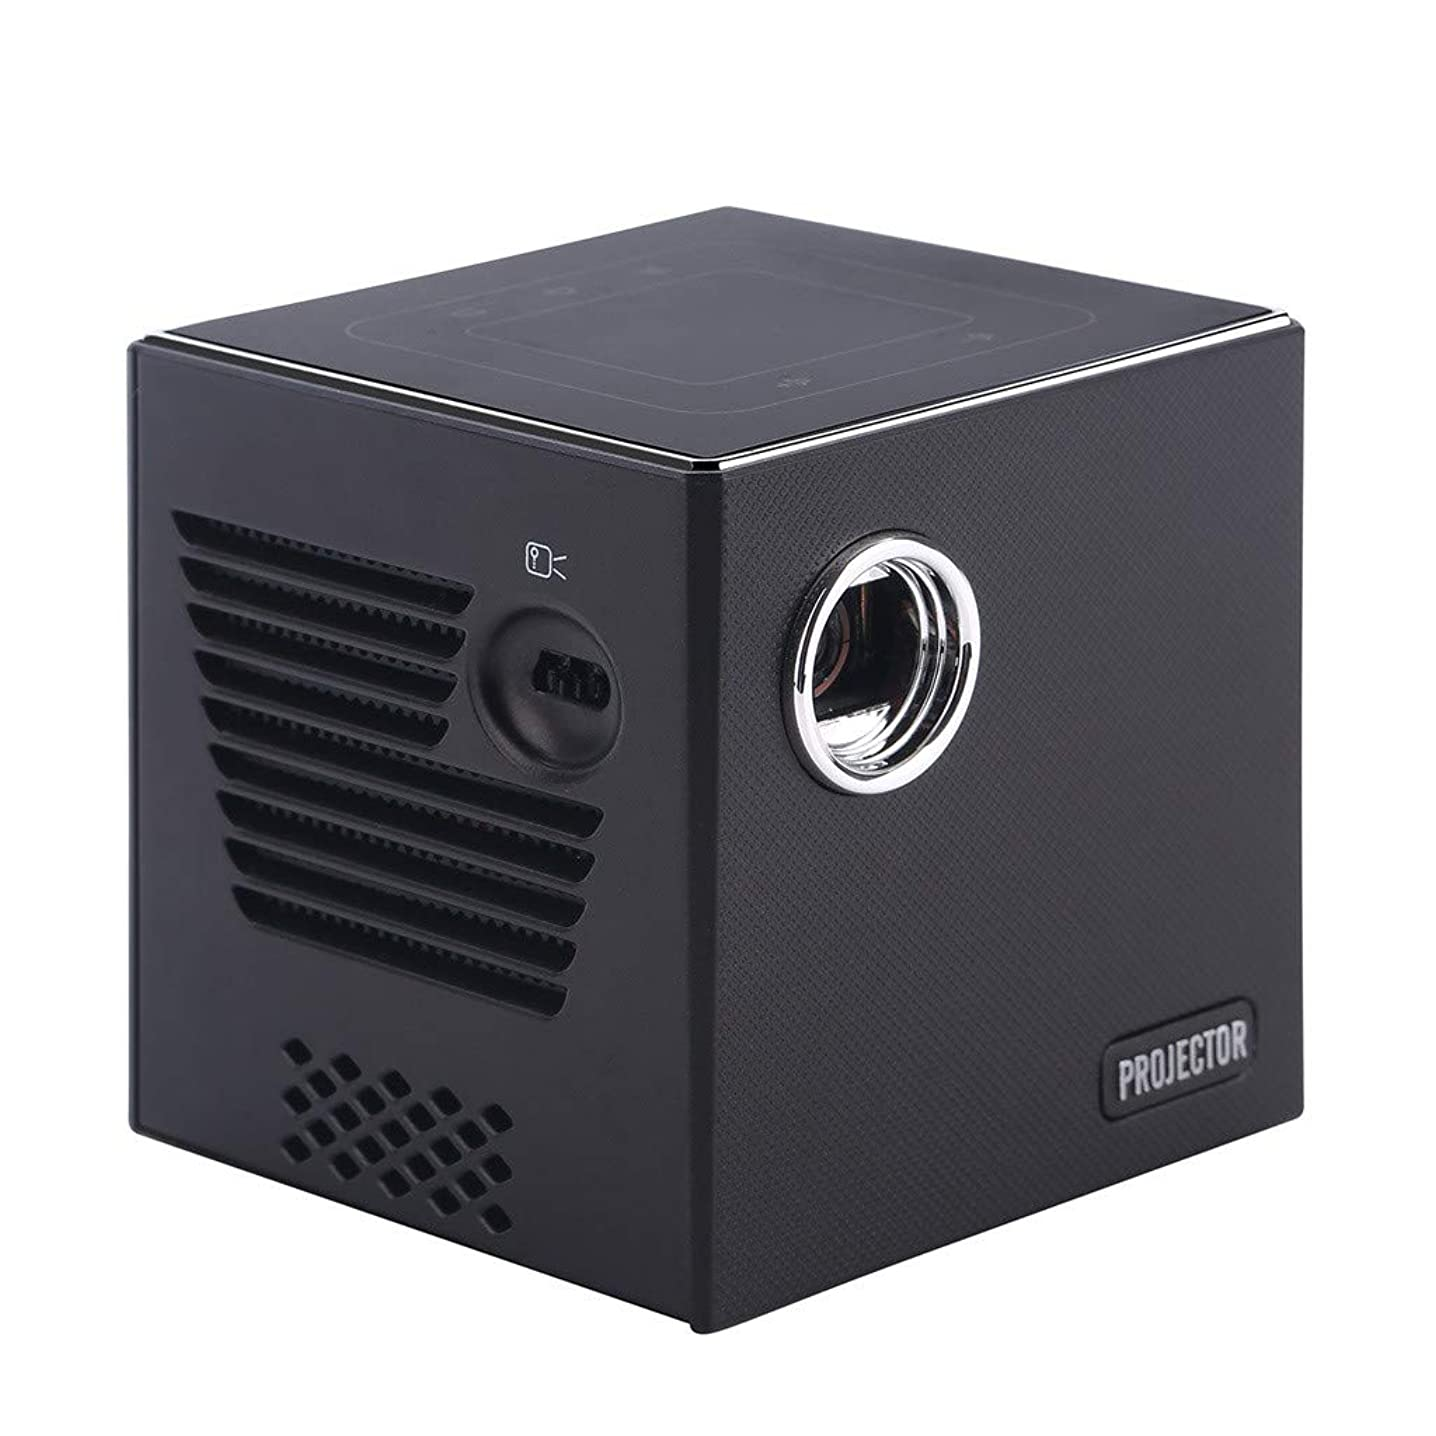 Smart DLP LED Projector - Optical Lens Technology 1080P Full HD Mini Portable Home Entertainment Projector, Movie Projectors, Brightness Video Projector, Home Entertainment (? Black)